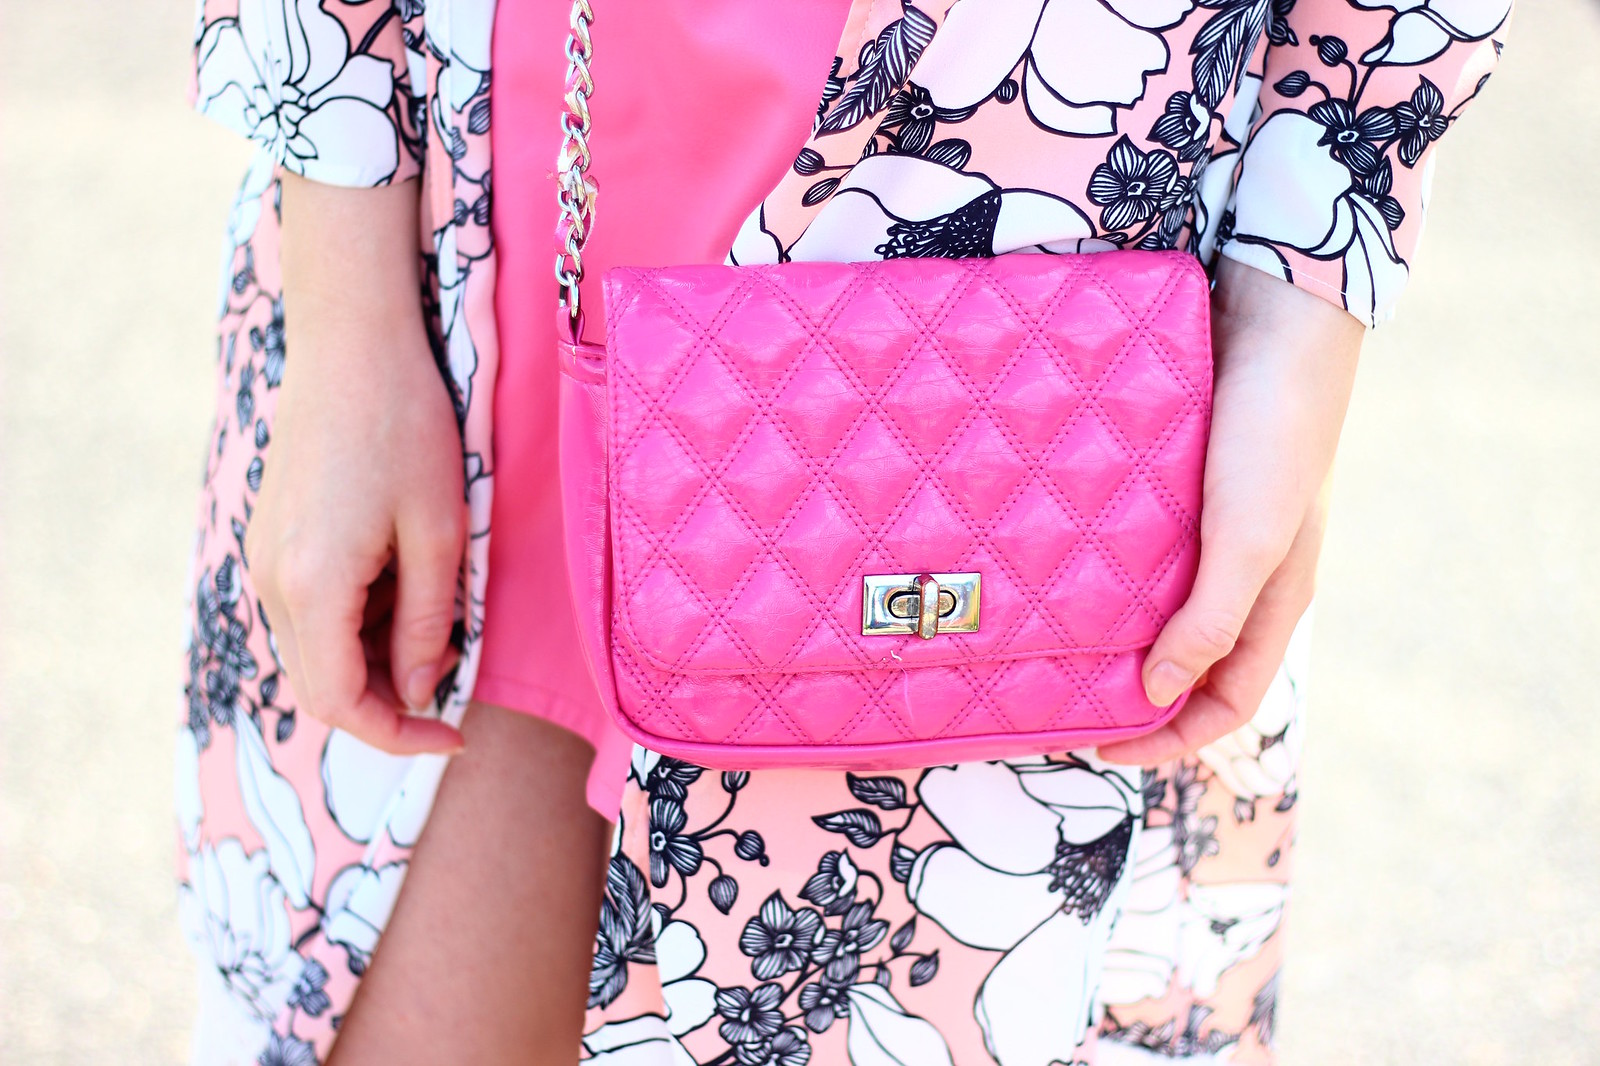 5pinkfloydtee, band tee pink skirt outfit, style, boho